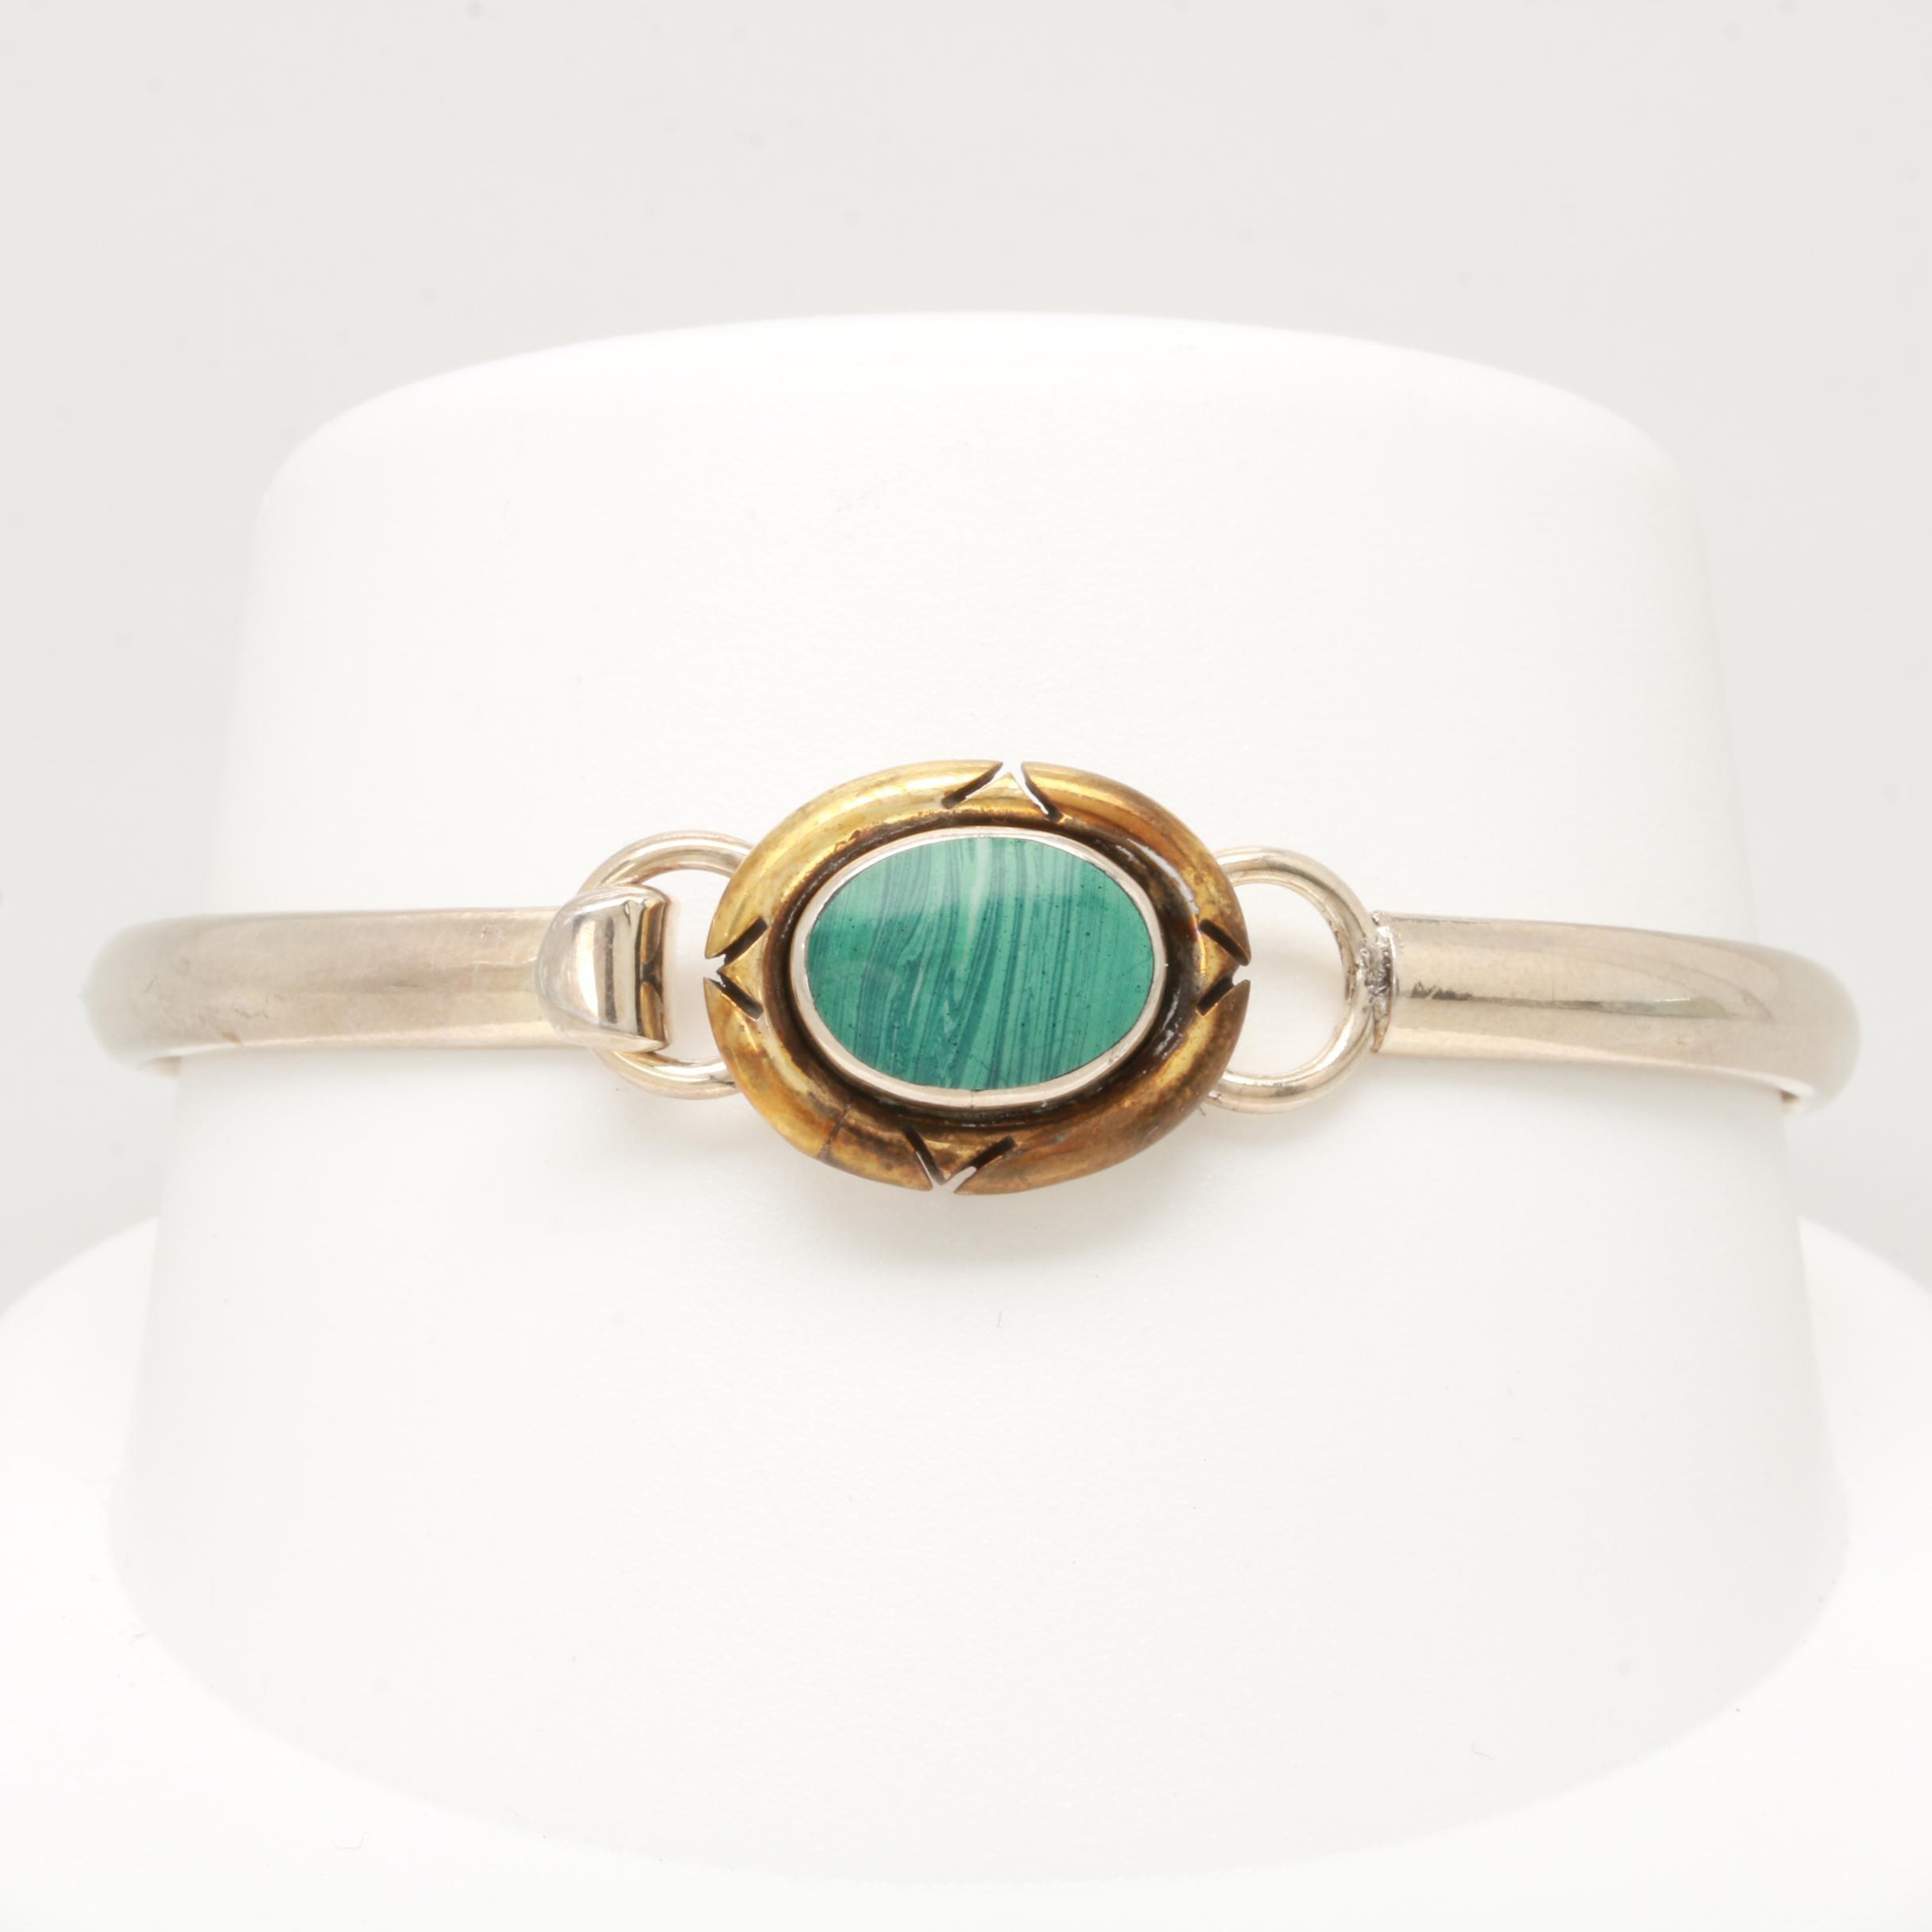 Mexican Sterling Silver Imitation Malachite Bangle Bracelet